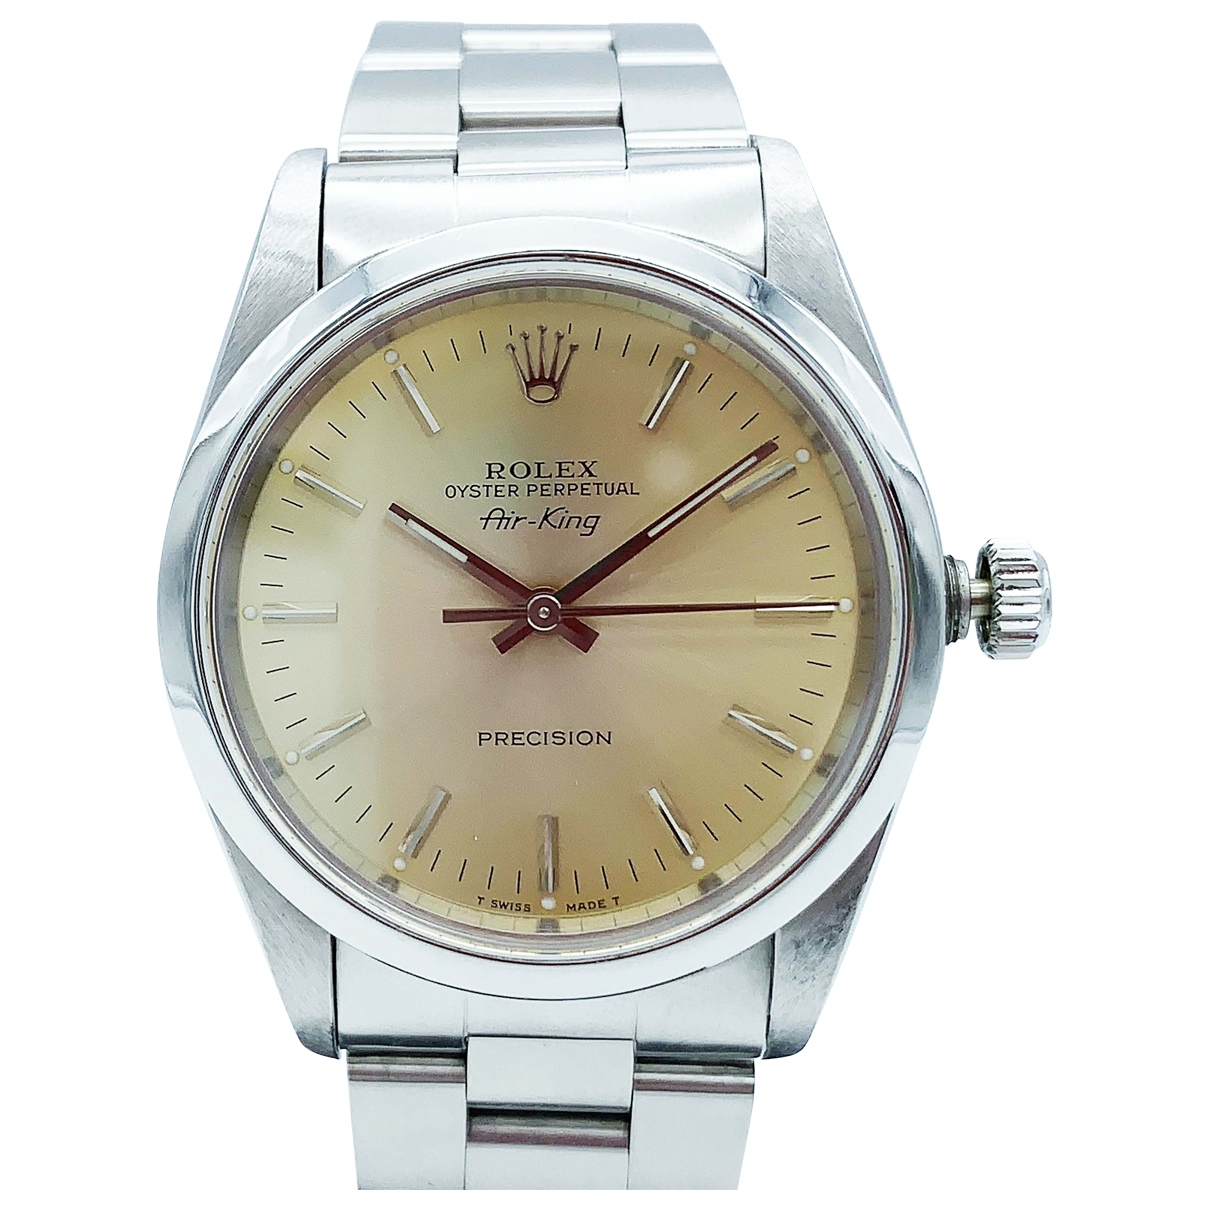 Rolex Air King Uhr in  Kamel Stahl